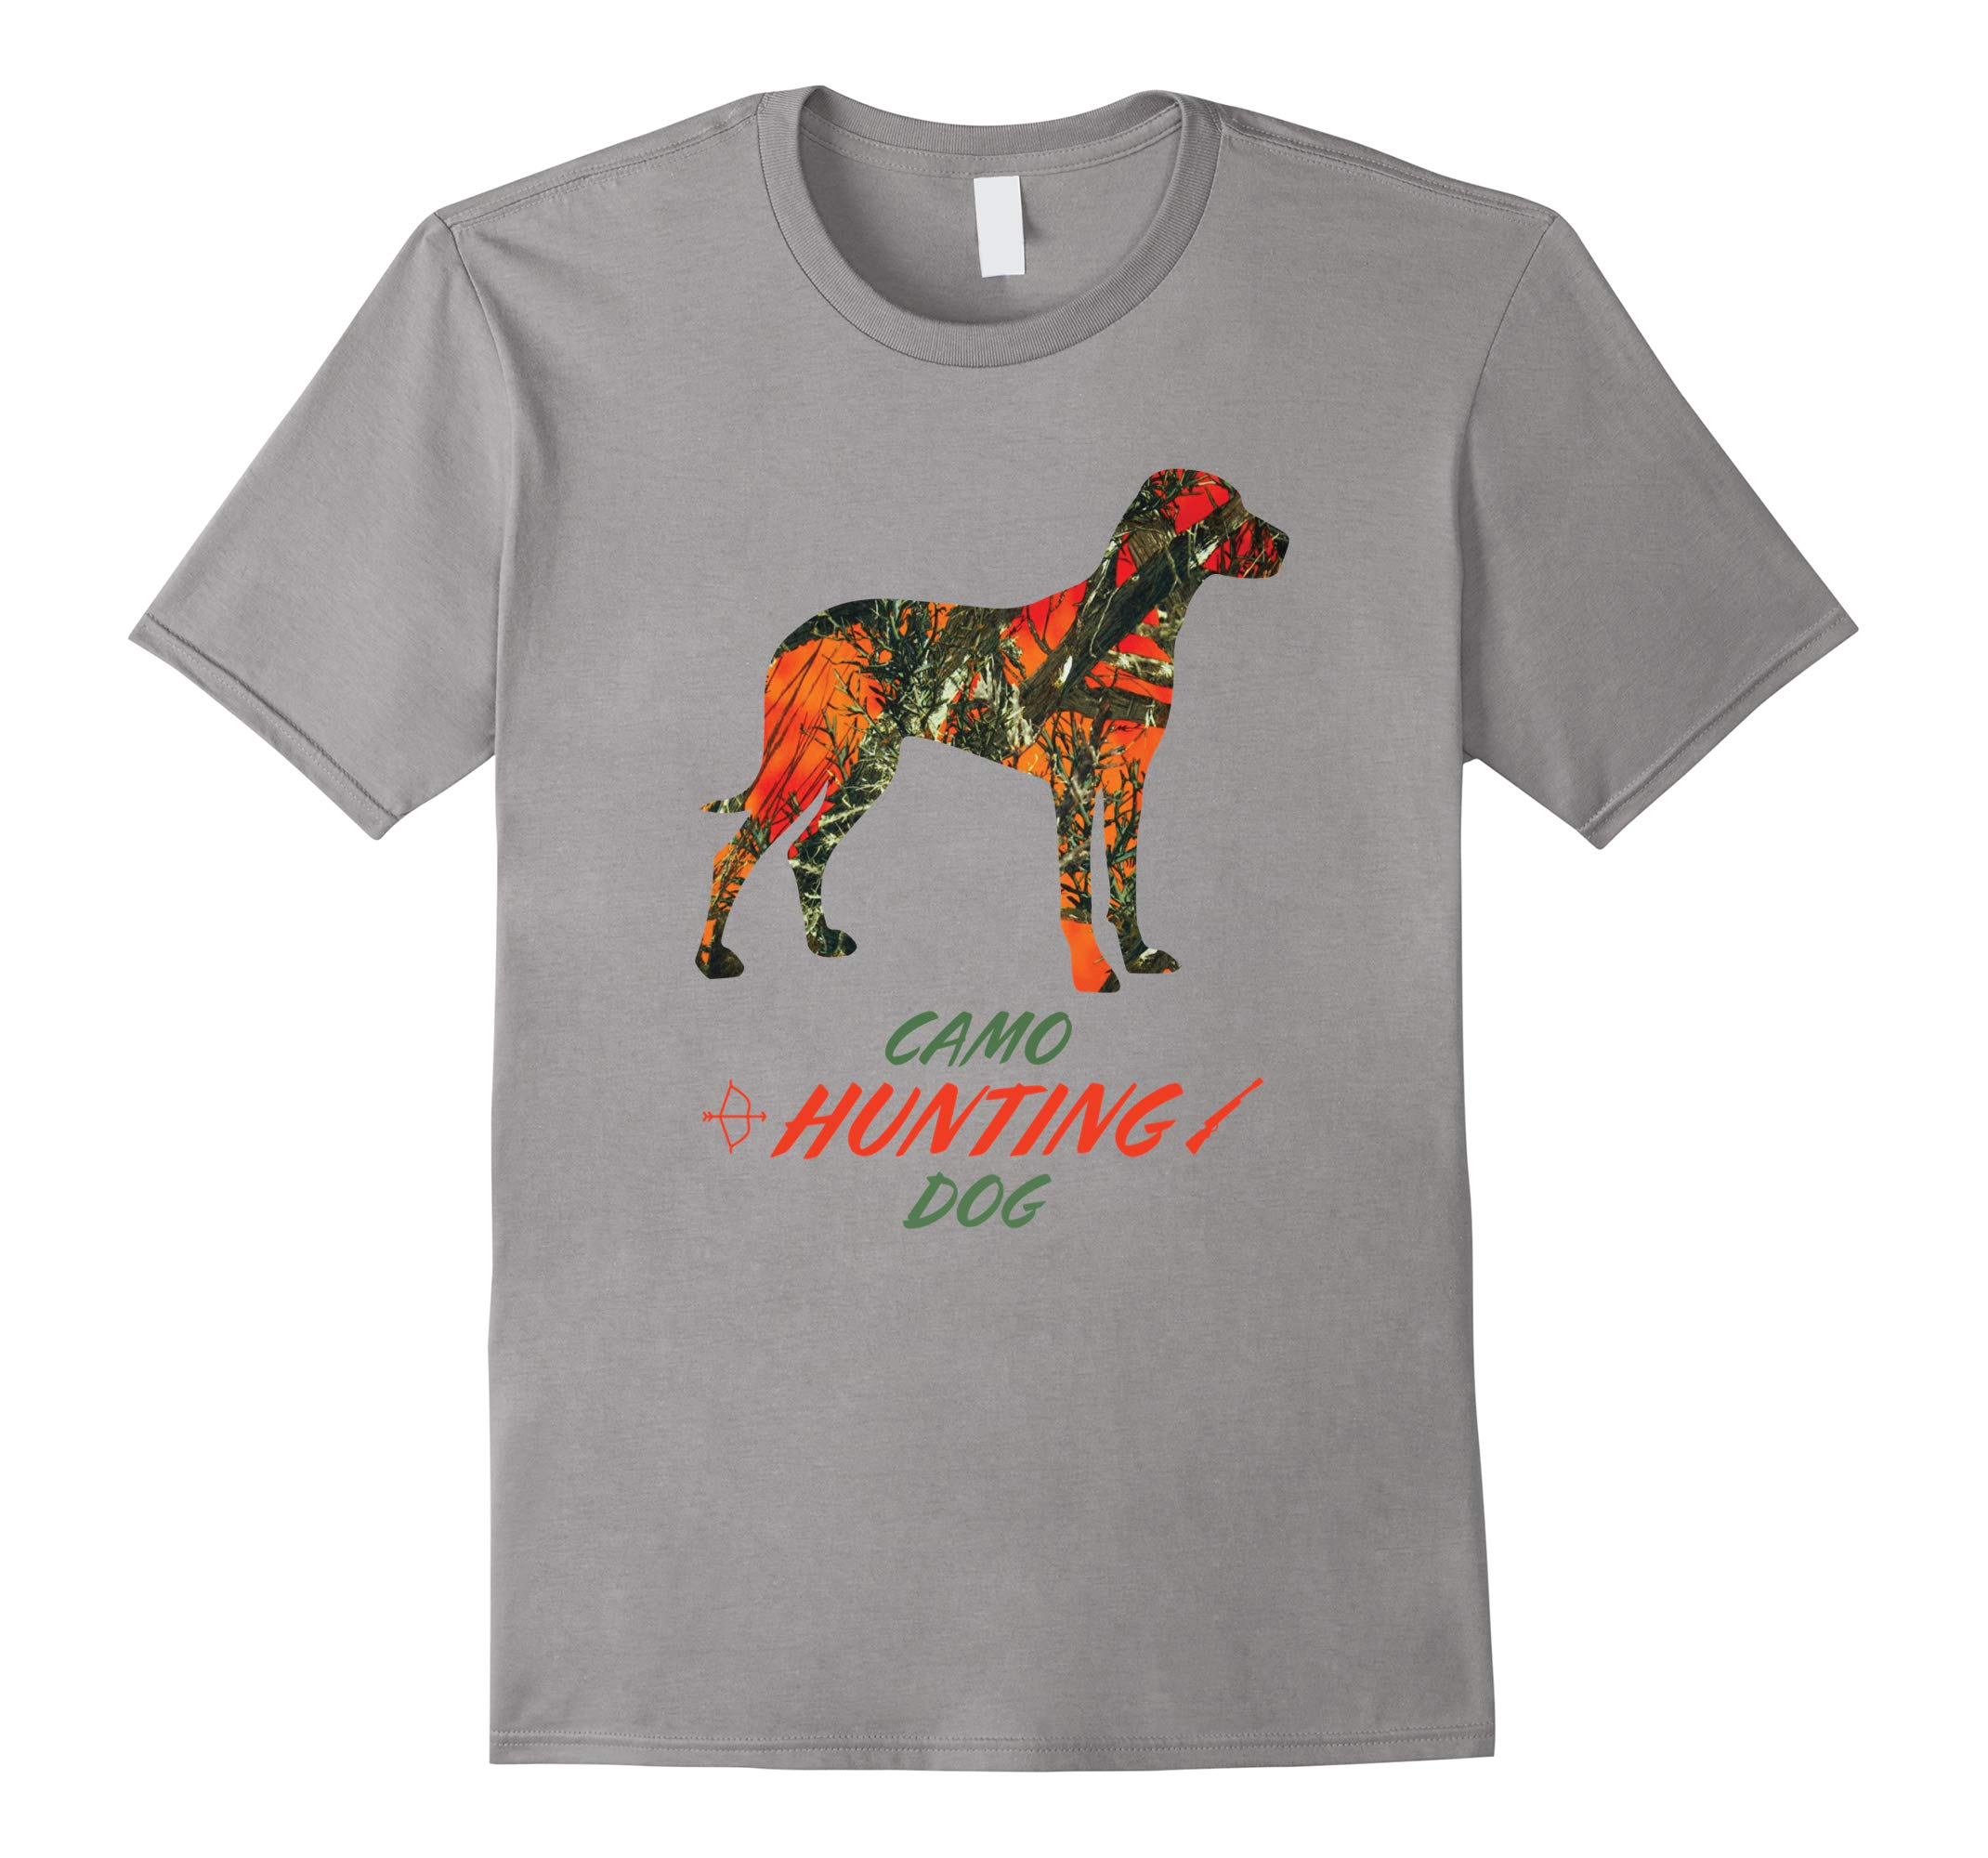 Camo Labrador Hunting Dog T-shirt-RT